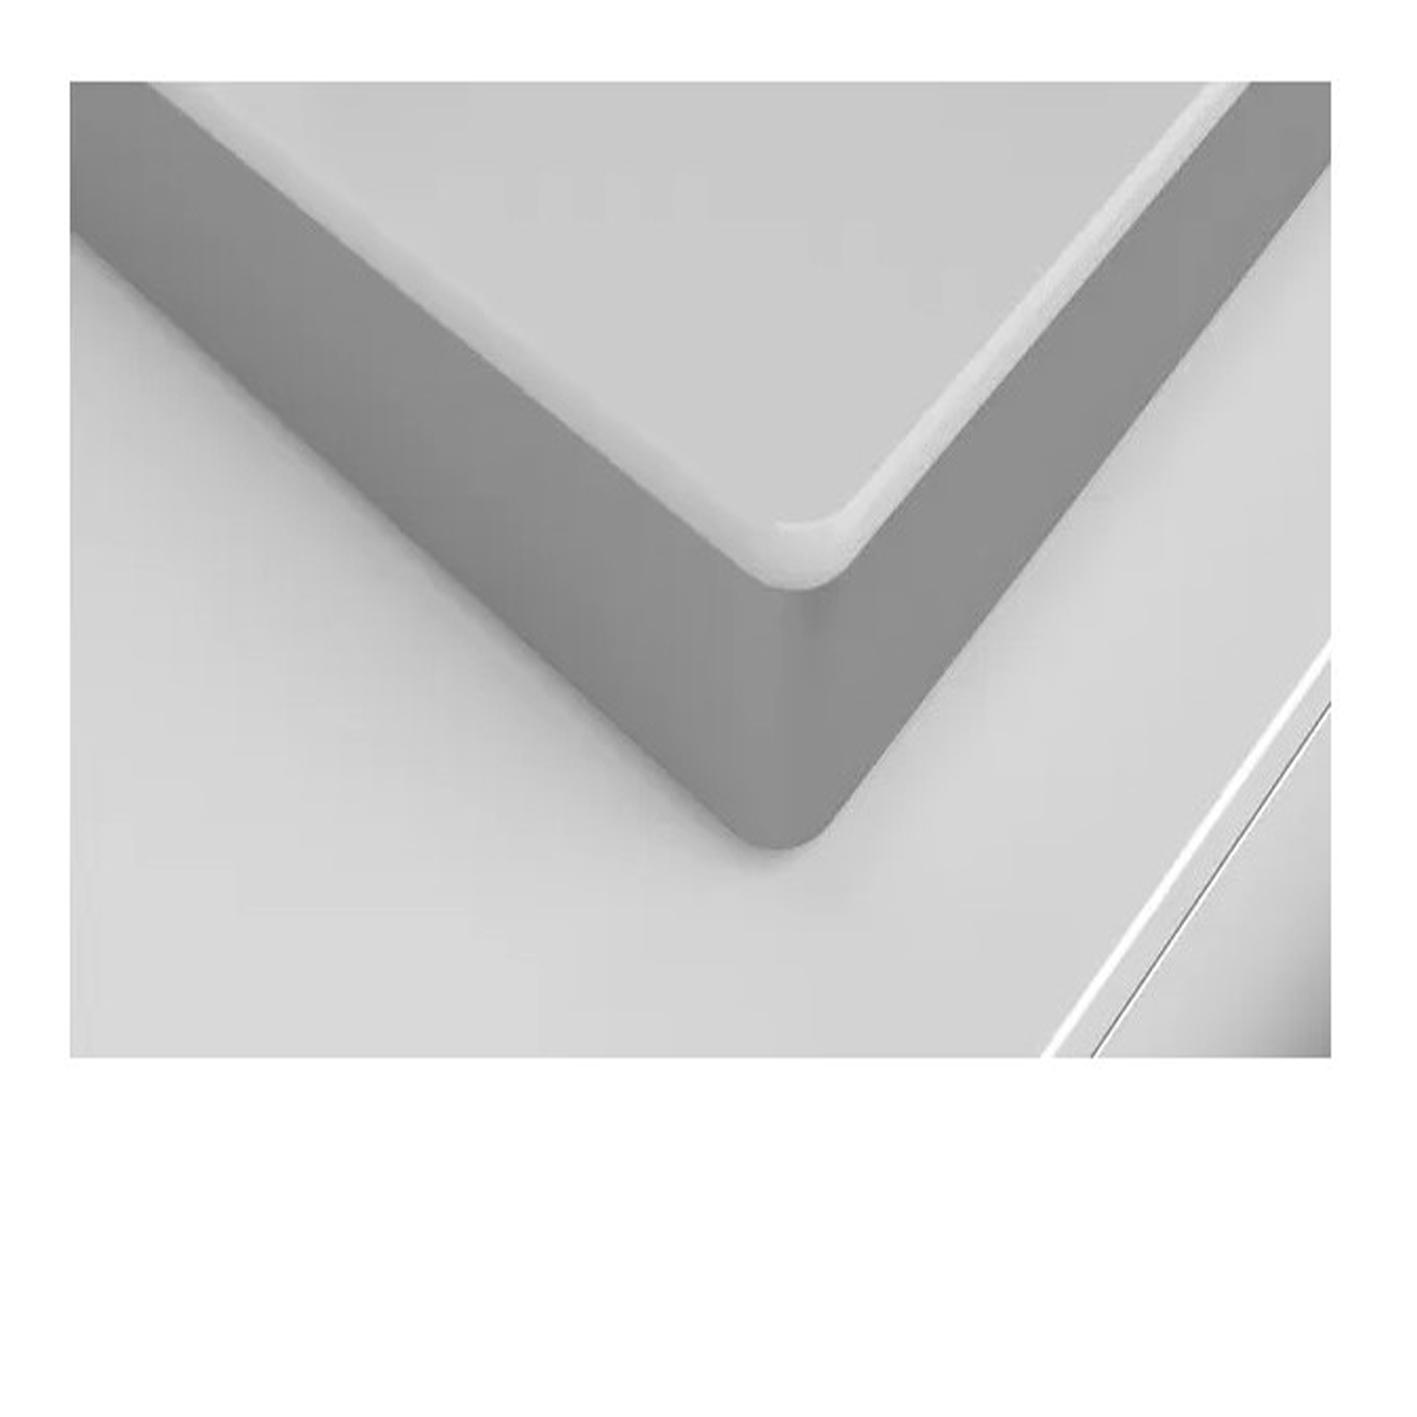 Profilo OO30P2B10D Beyaz Camlı Dörtlü Set Üstü Ocak